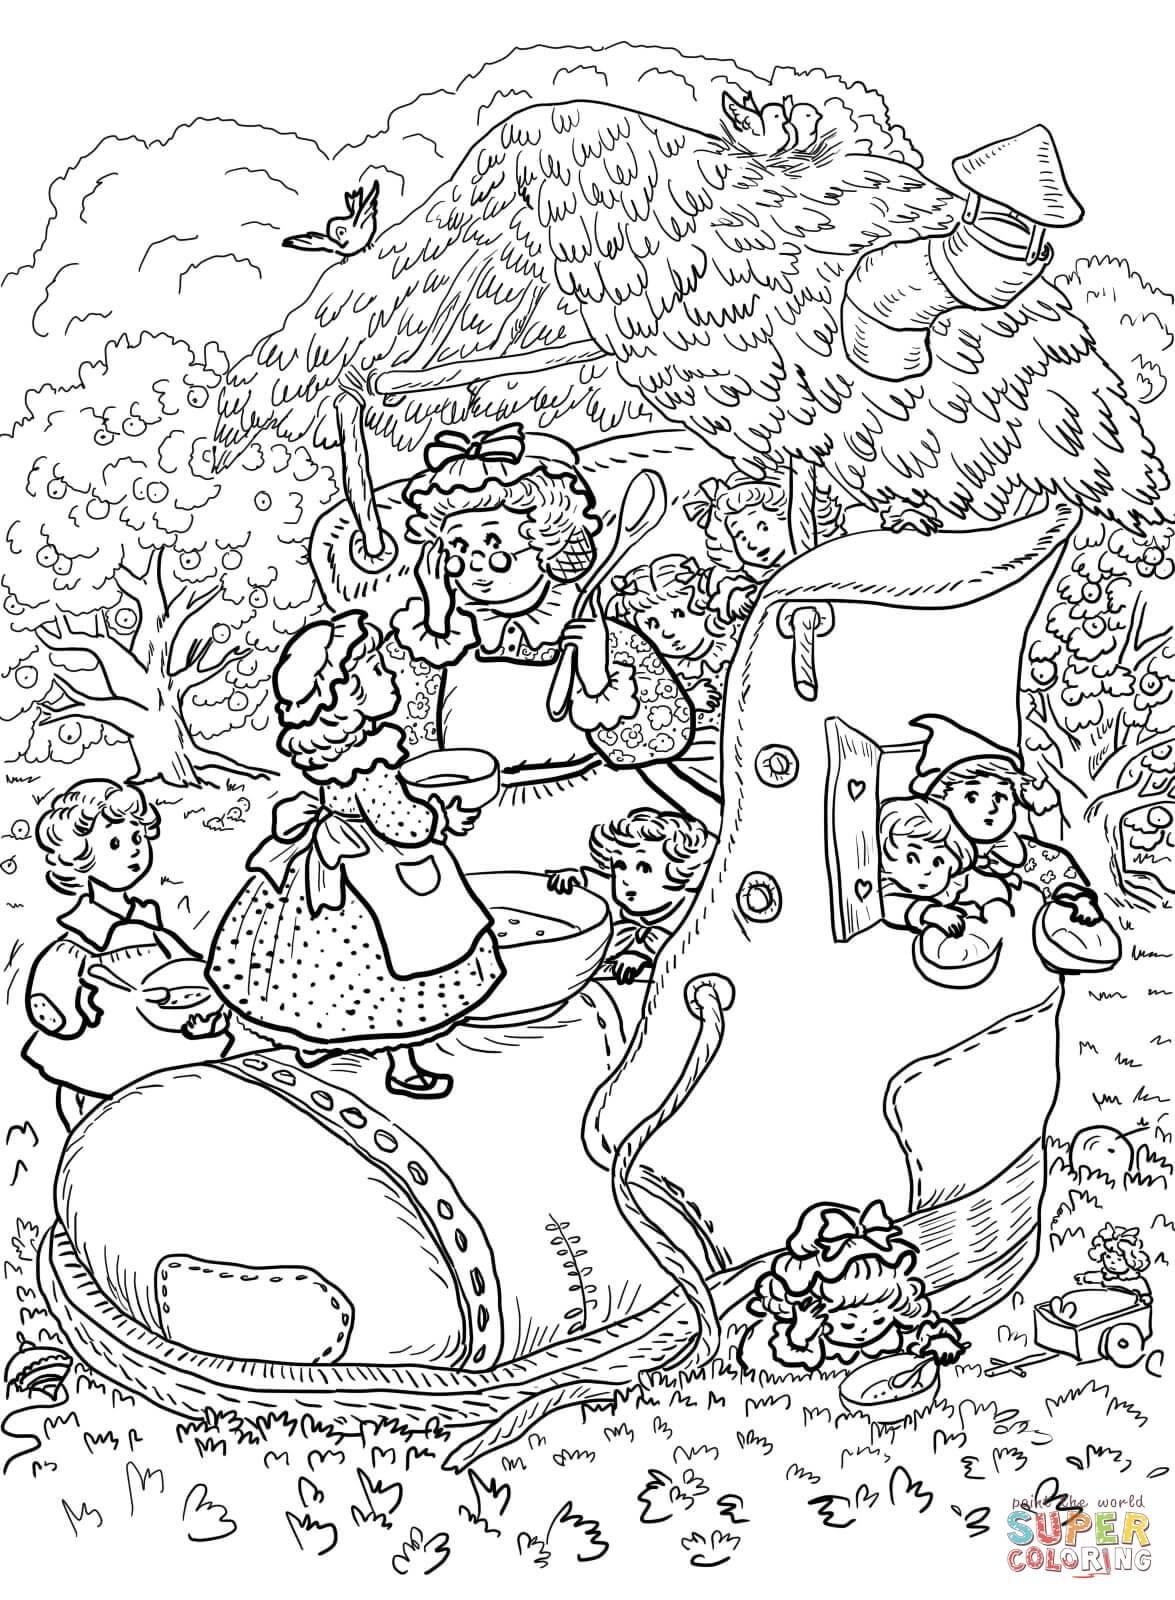 Mother Goose Nursery Rhymes Coloring Pages | Free Coloring Pages - Free Printable Mother Goose Nursery Rhymes